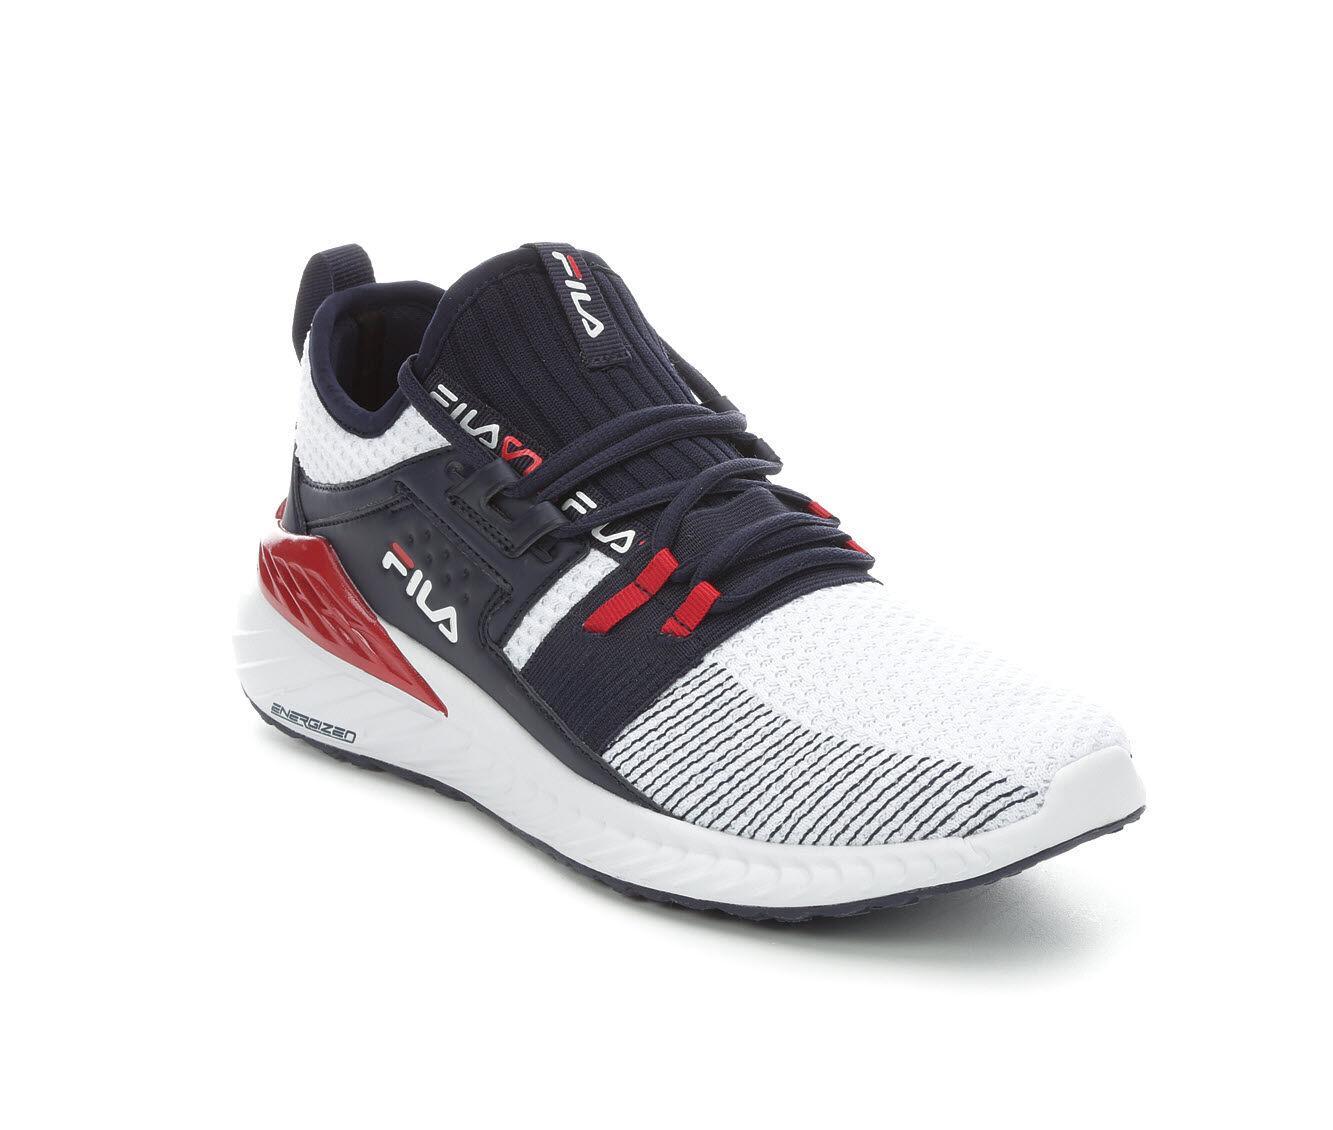 Realmspeed 20 Energized Athletic Shoe